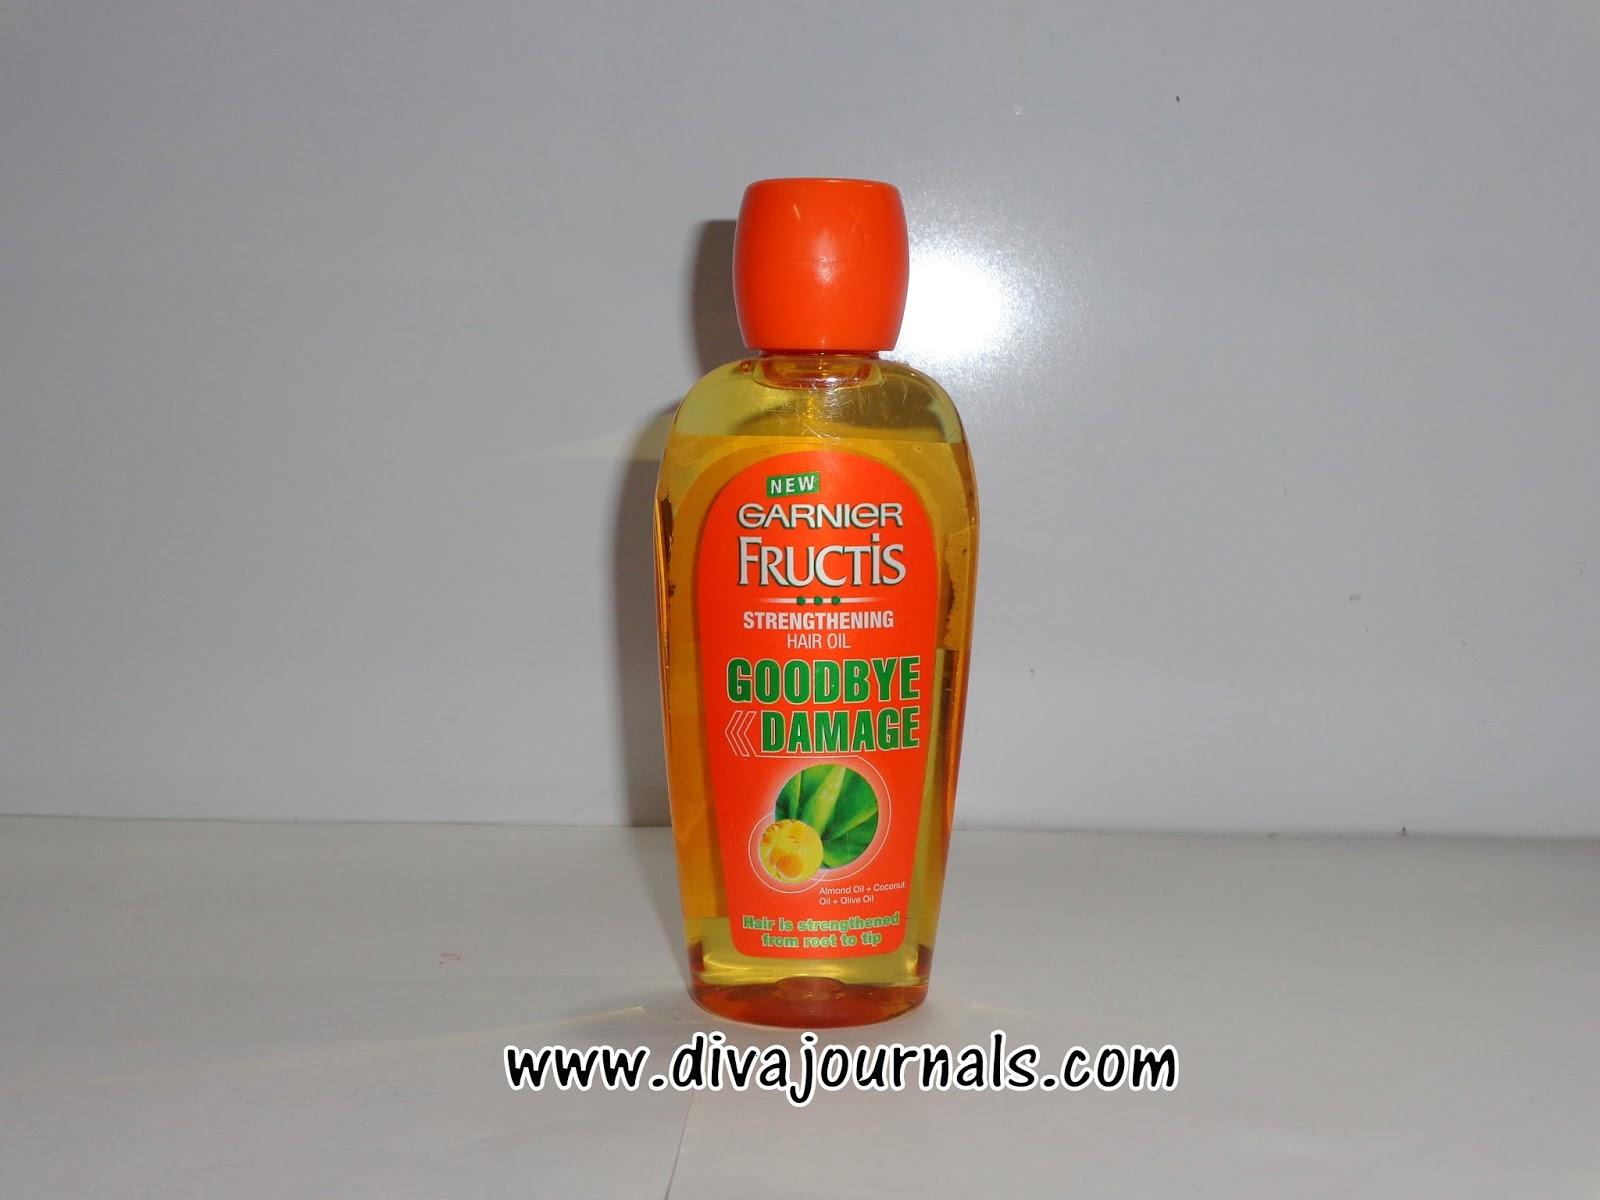 Garnier Fructis Goodbye Damage Shampoo-Conditioner-Serum-Oil Review